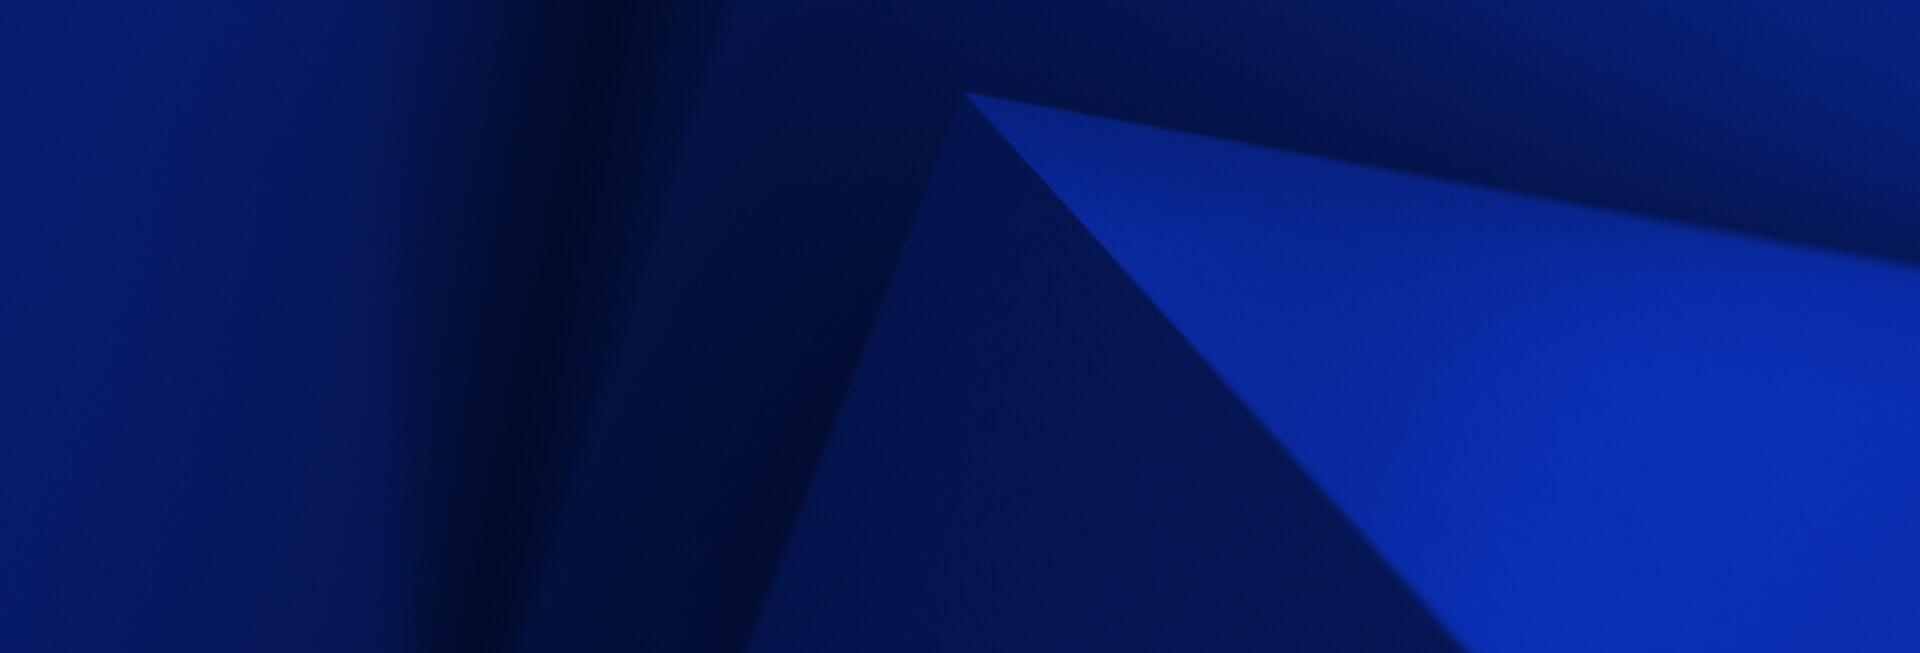 rra-background-blue-13-2021.jpg